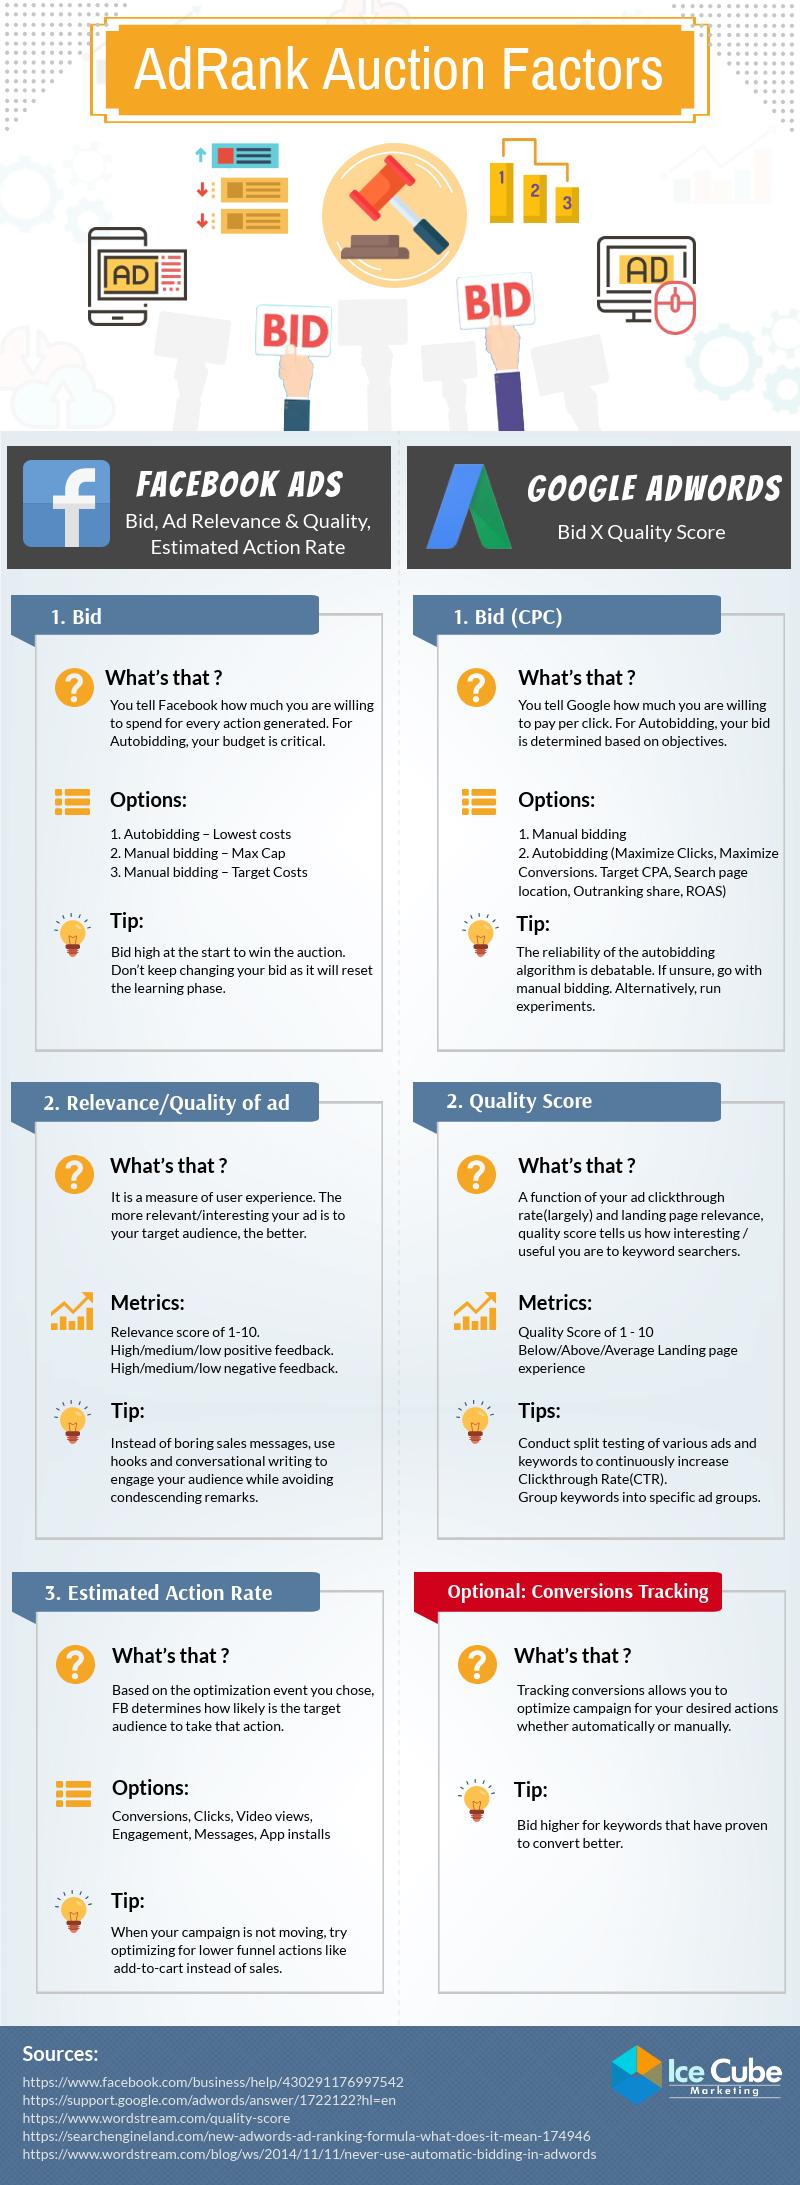 Infographic: Facebook vs Google Ads